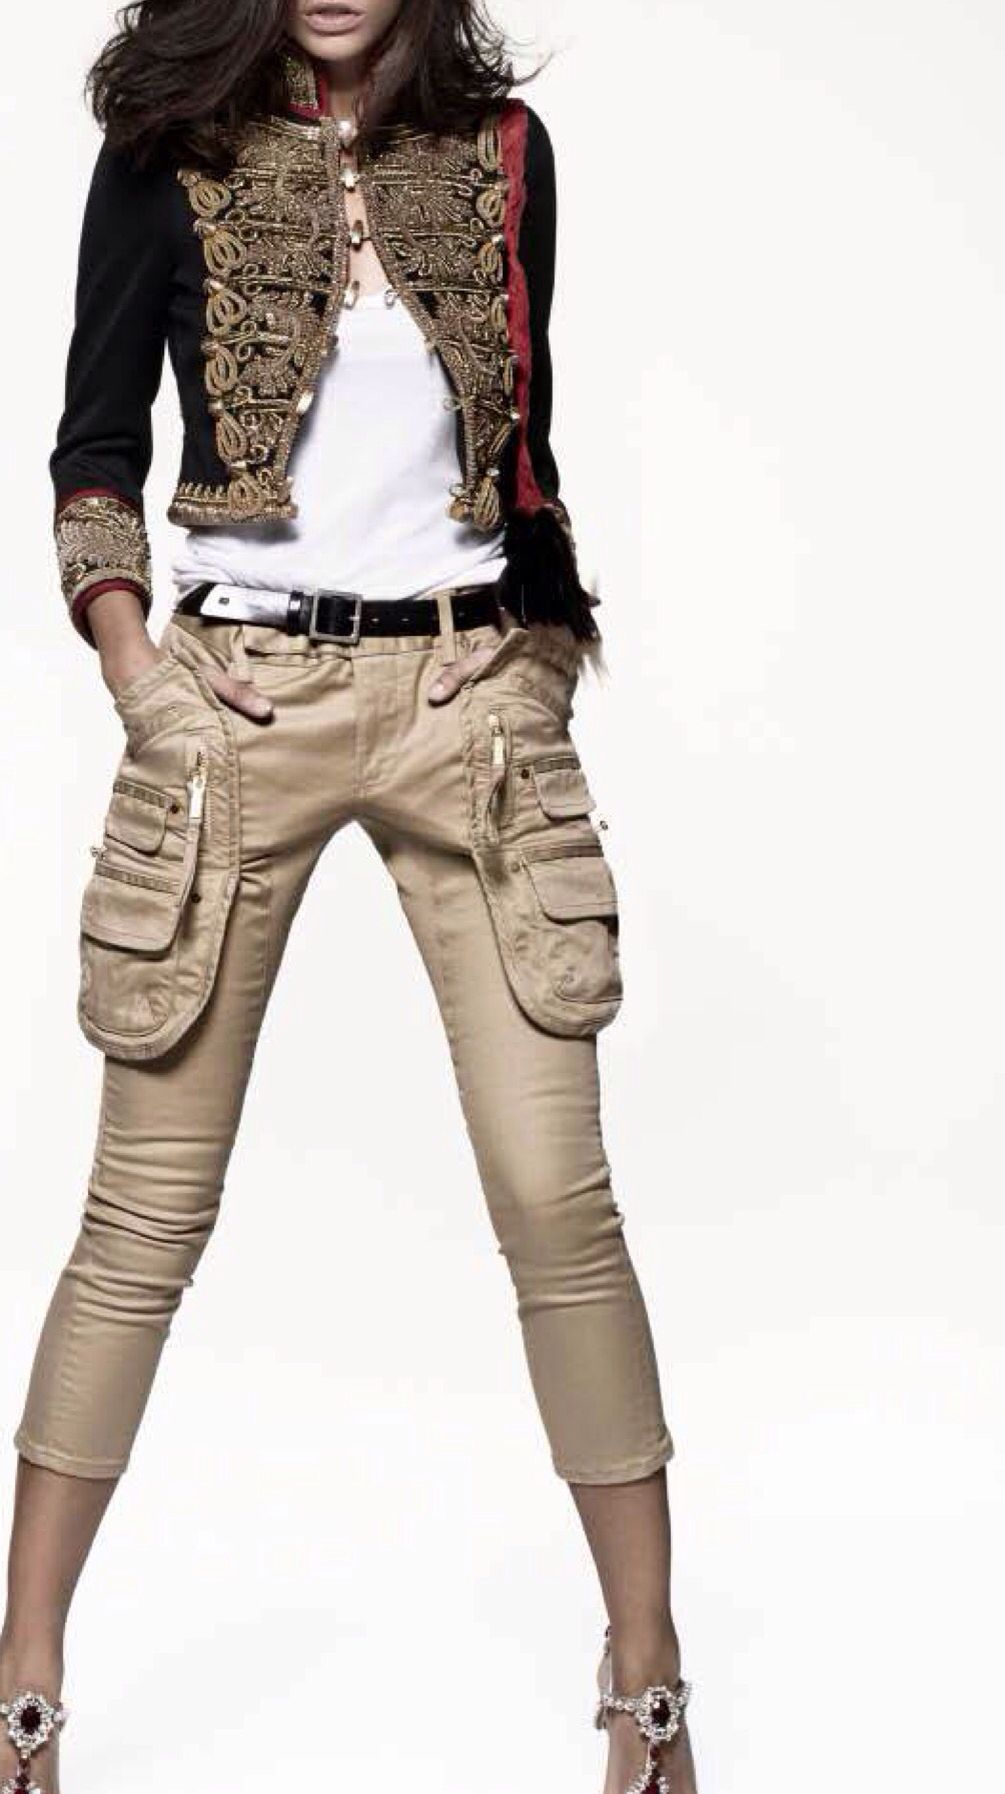 dsquared2 chaqueta militar pantal n cargo beige zapatos joya telva chaquetas militares. Black Bedroom Furniture Sets. Home Design Ideas